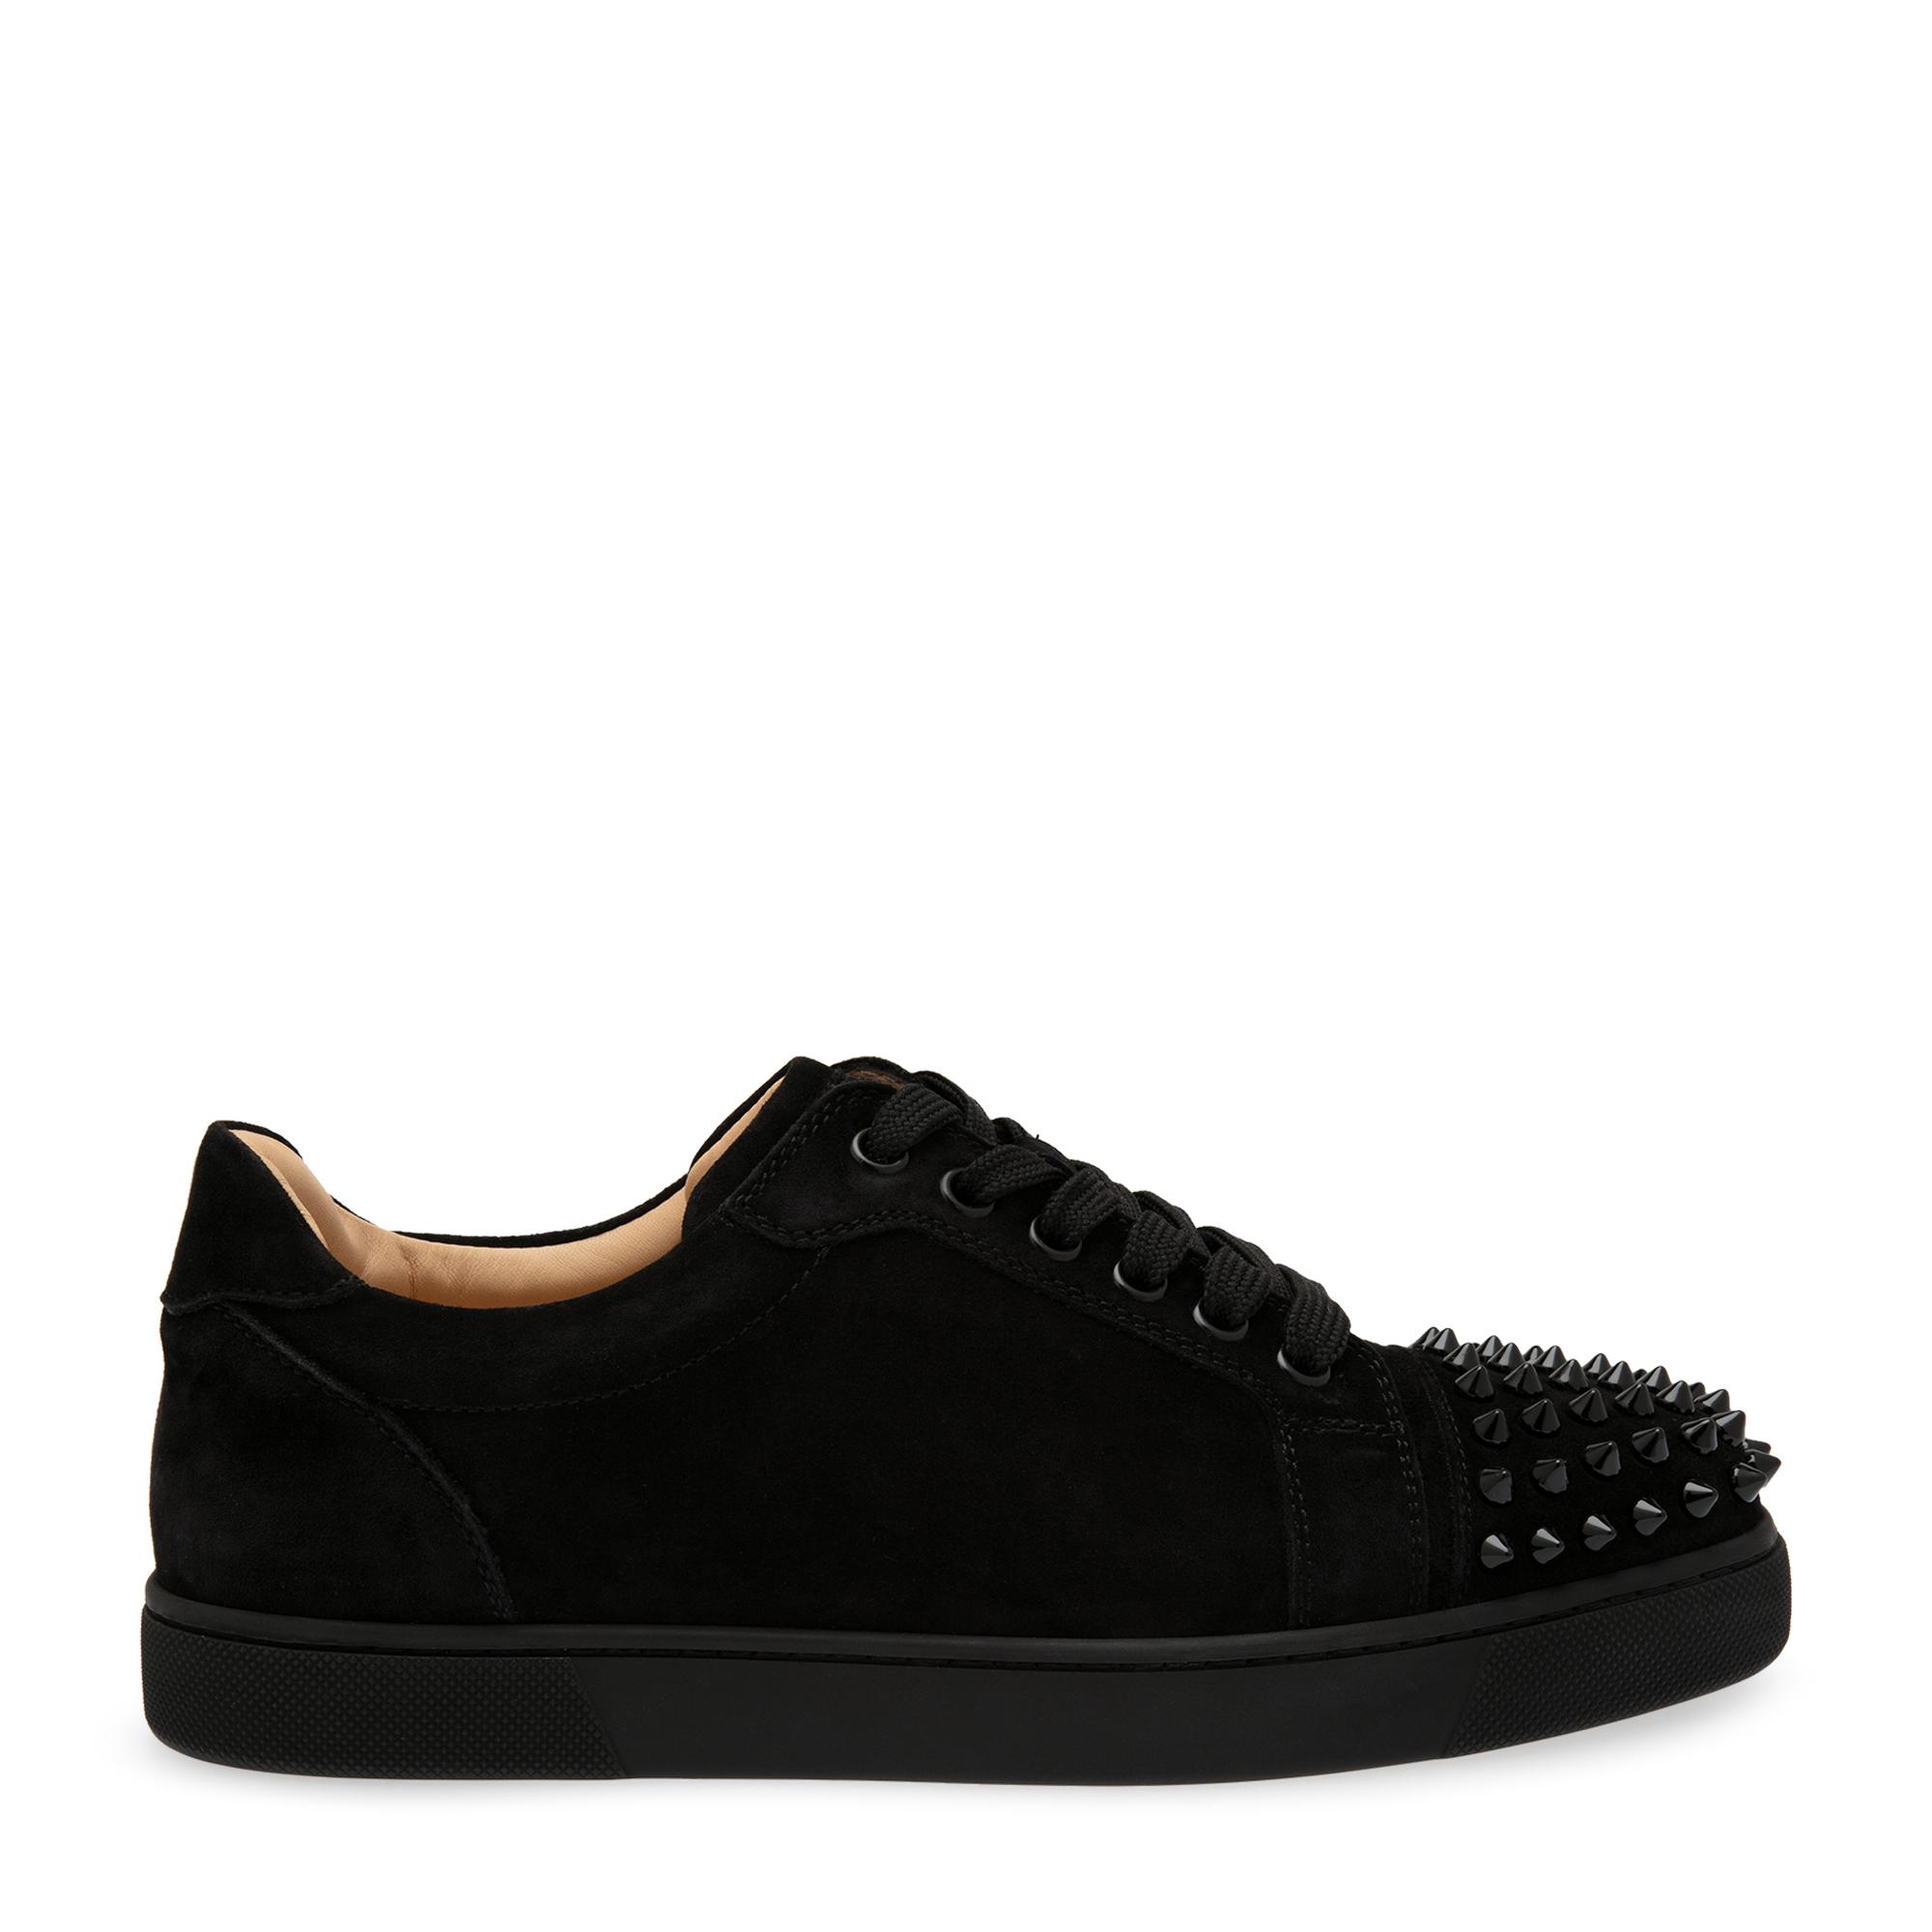 Vieira Spikes sneakers